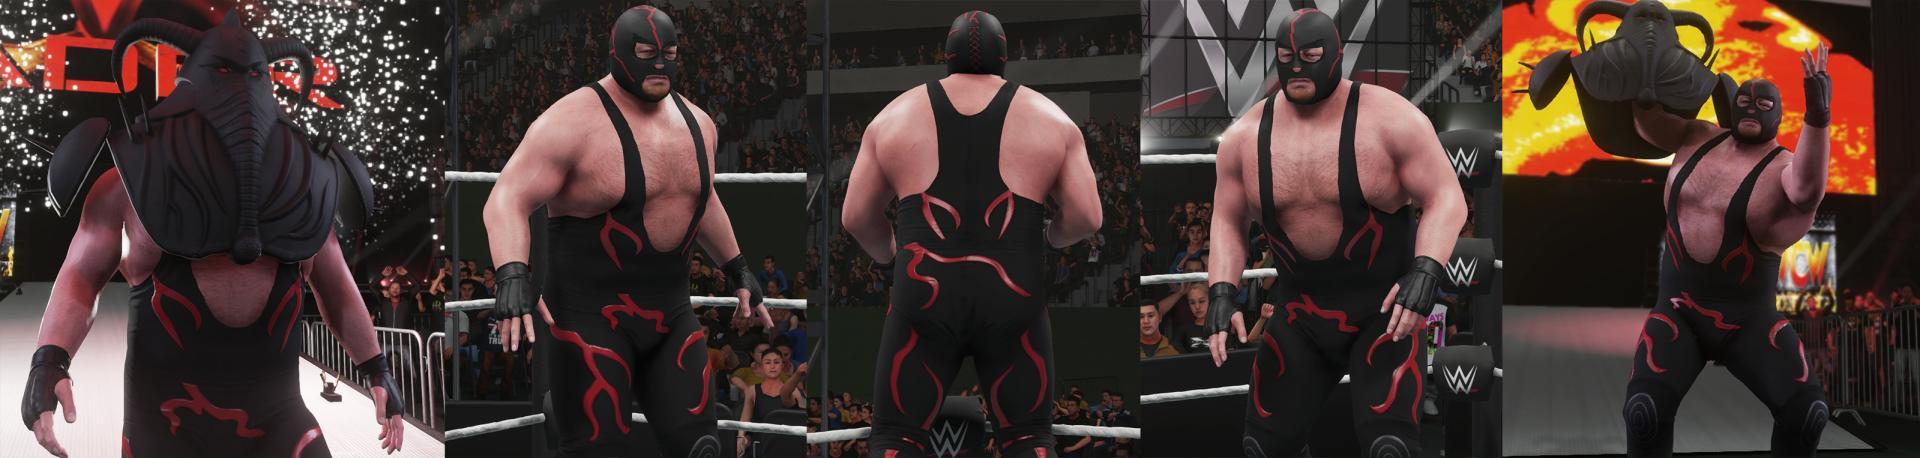 Vader_NJPW.jpg?width=1920&height=458